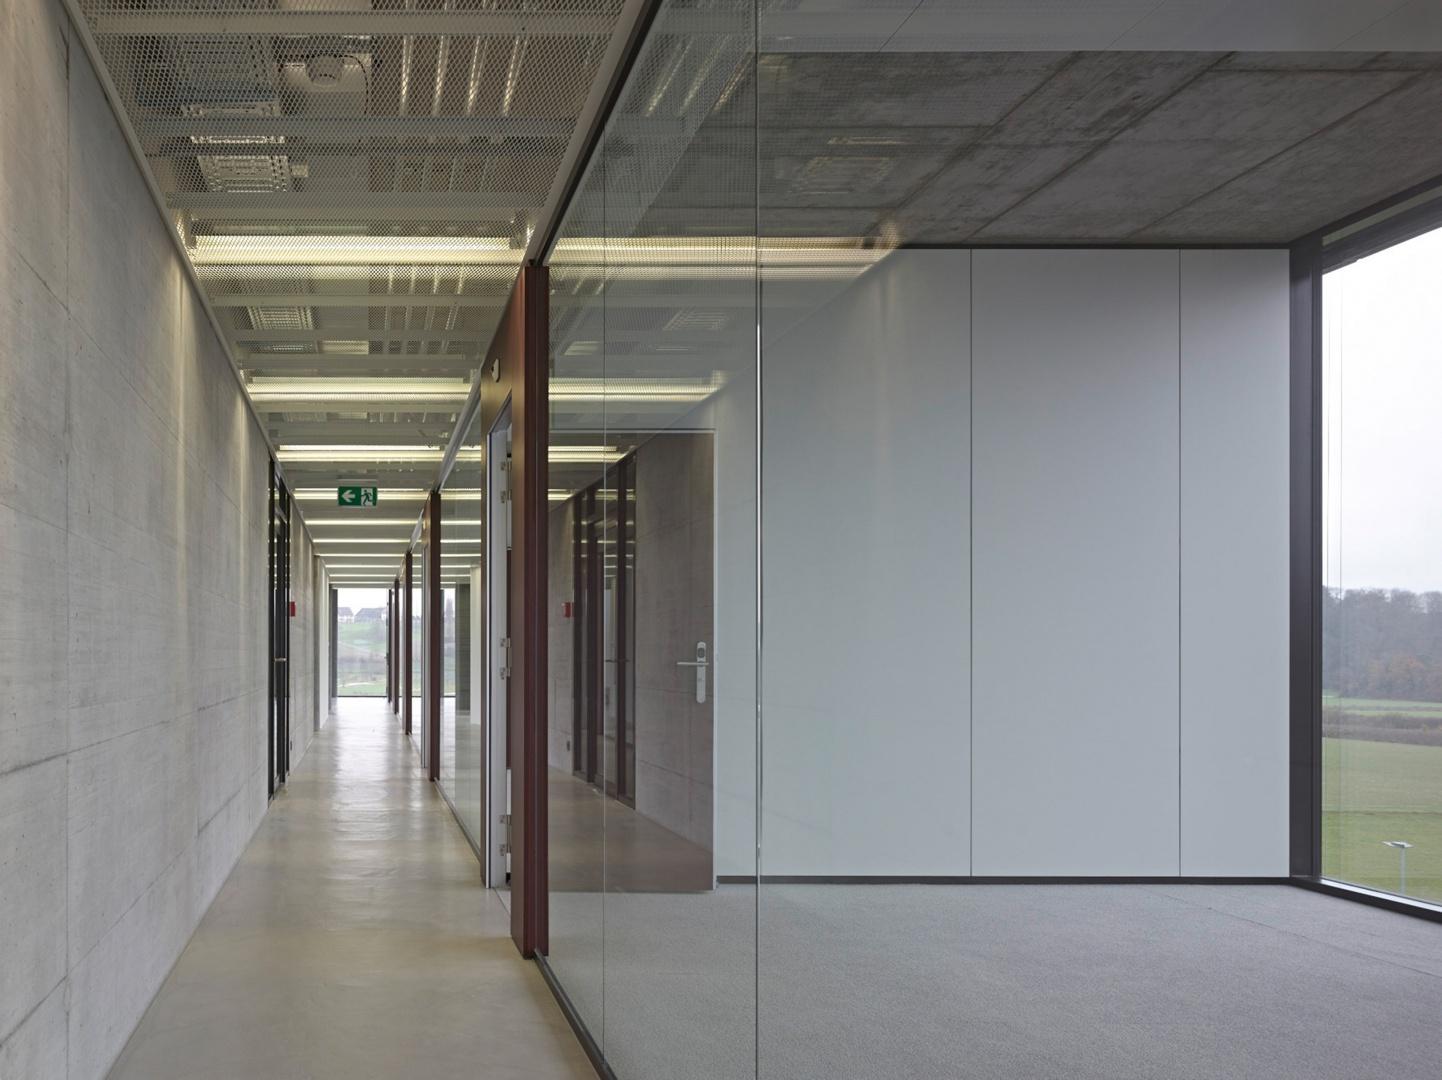 Büro © Foto: Roger Frei, Zürich